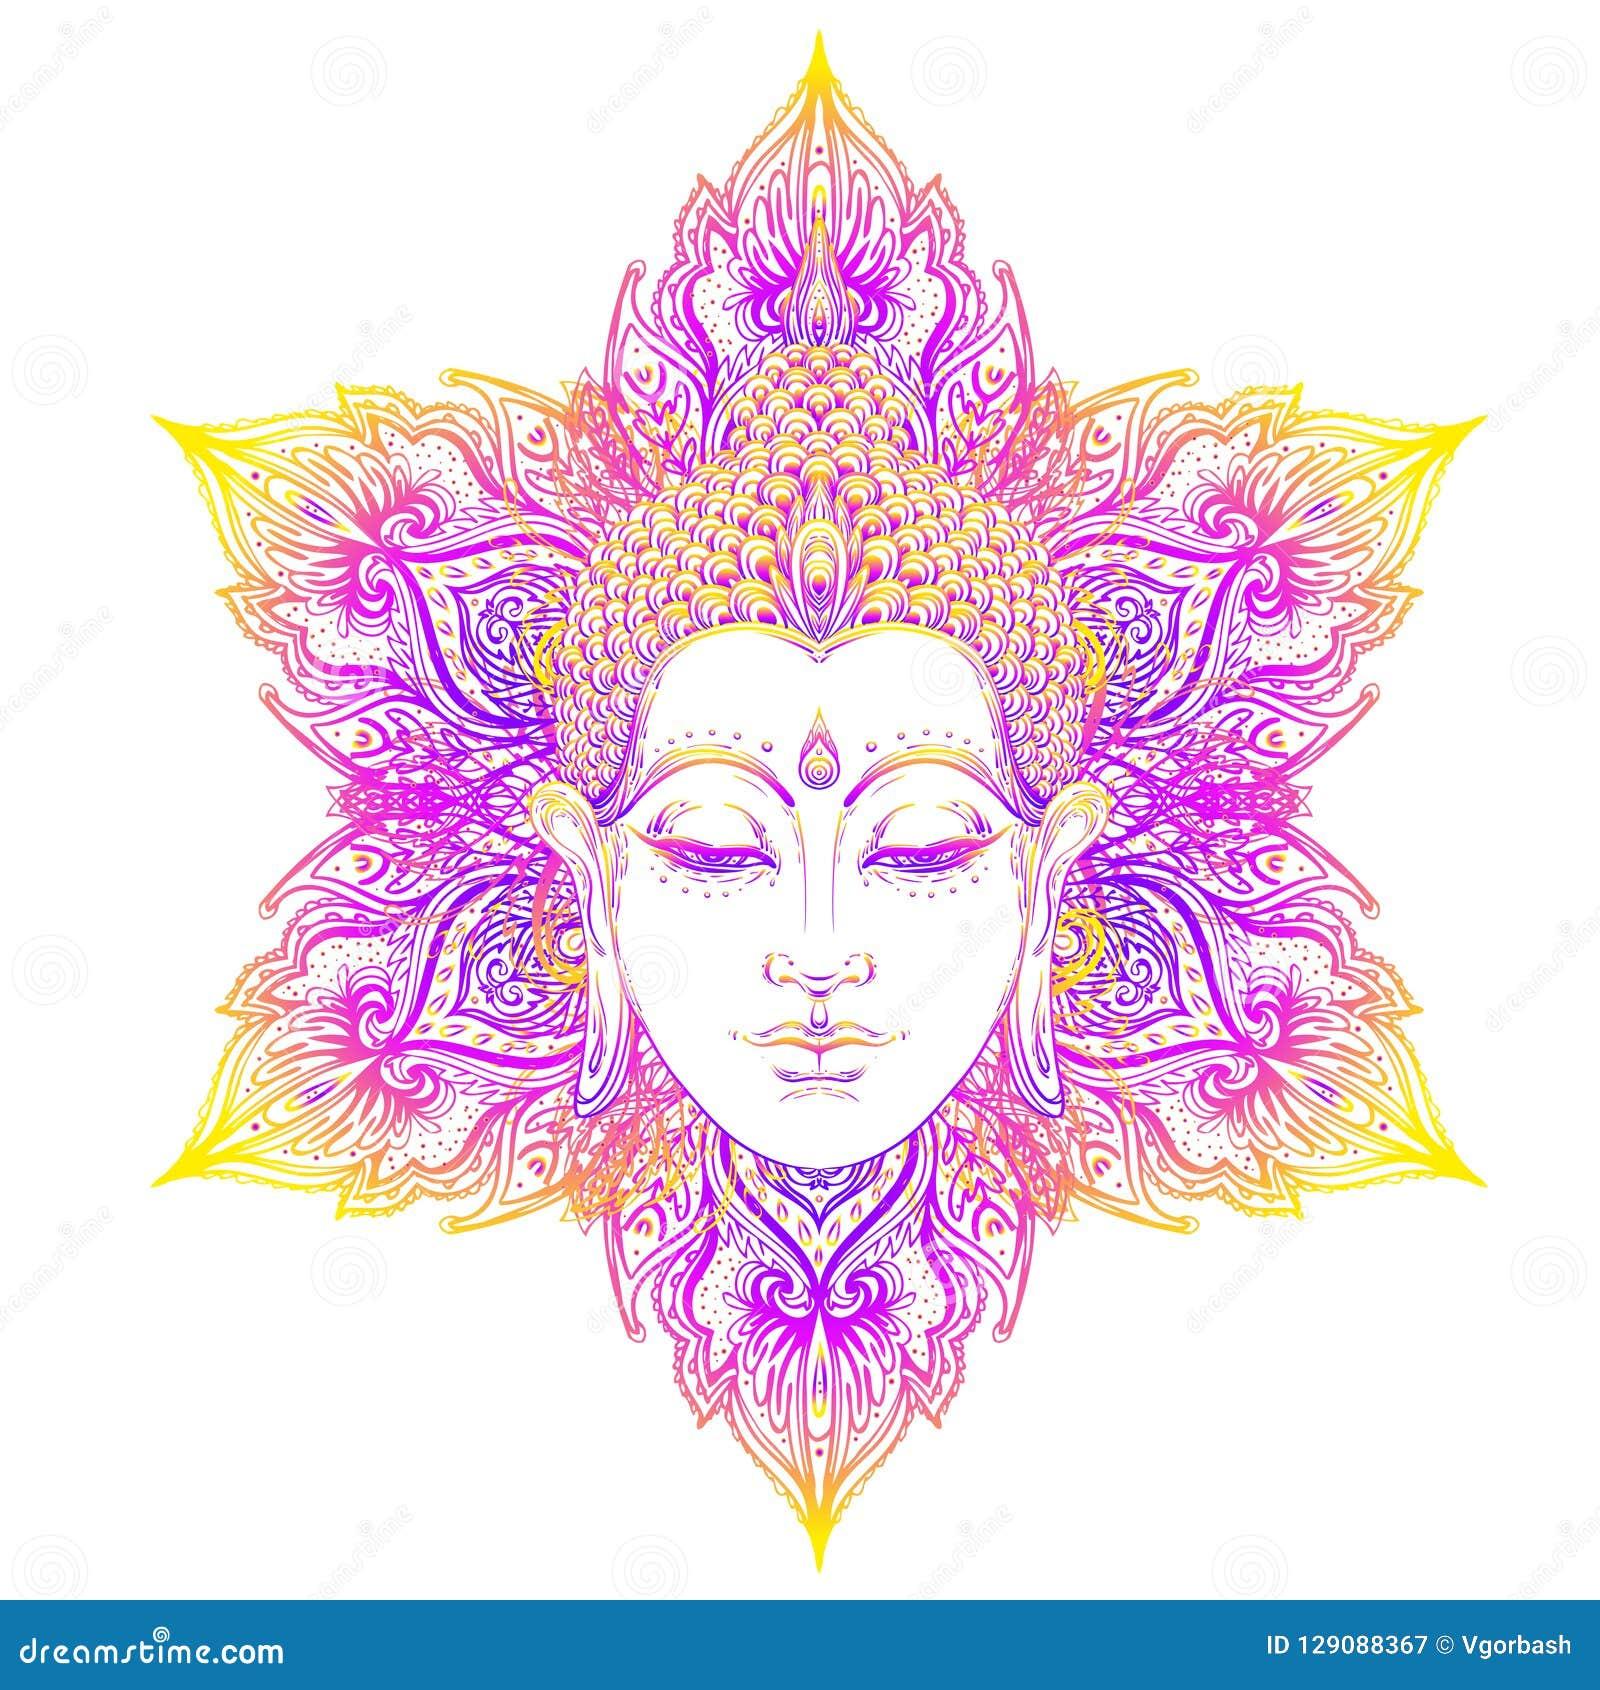 d2001dae602f4 Buddha face over ornate mandala round pattern. Esoteric vintage vector  illustration. Indian, Buddhism, spiritual art. Hippie tattoo, spirituality,  Thai god, ...